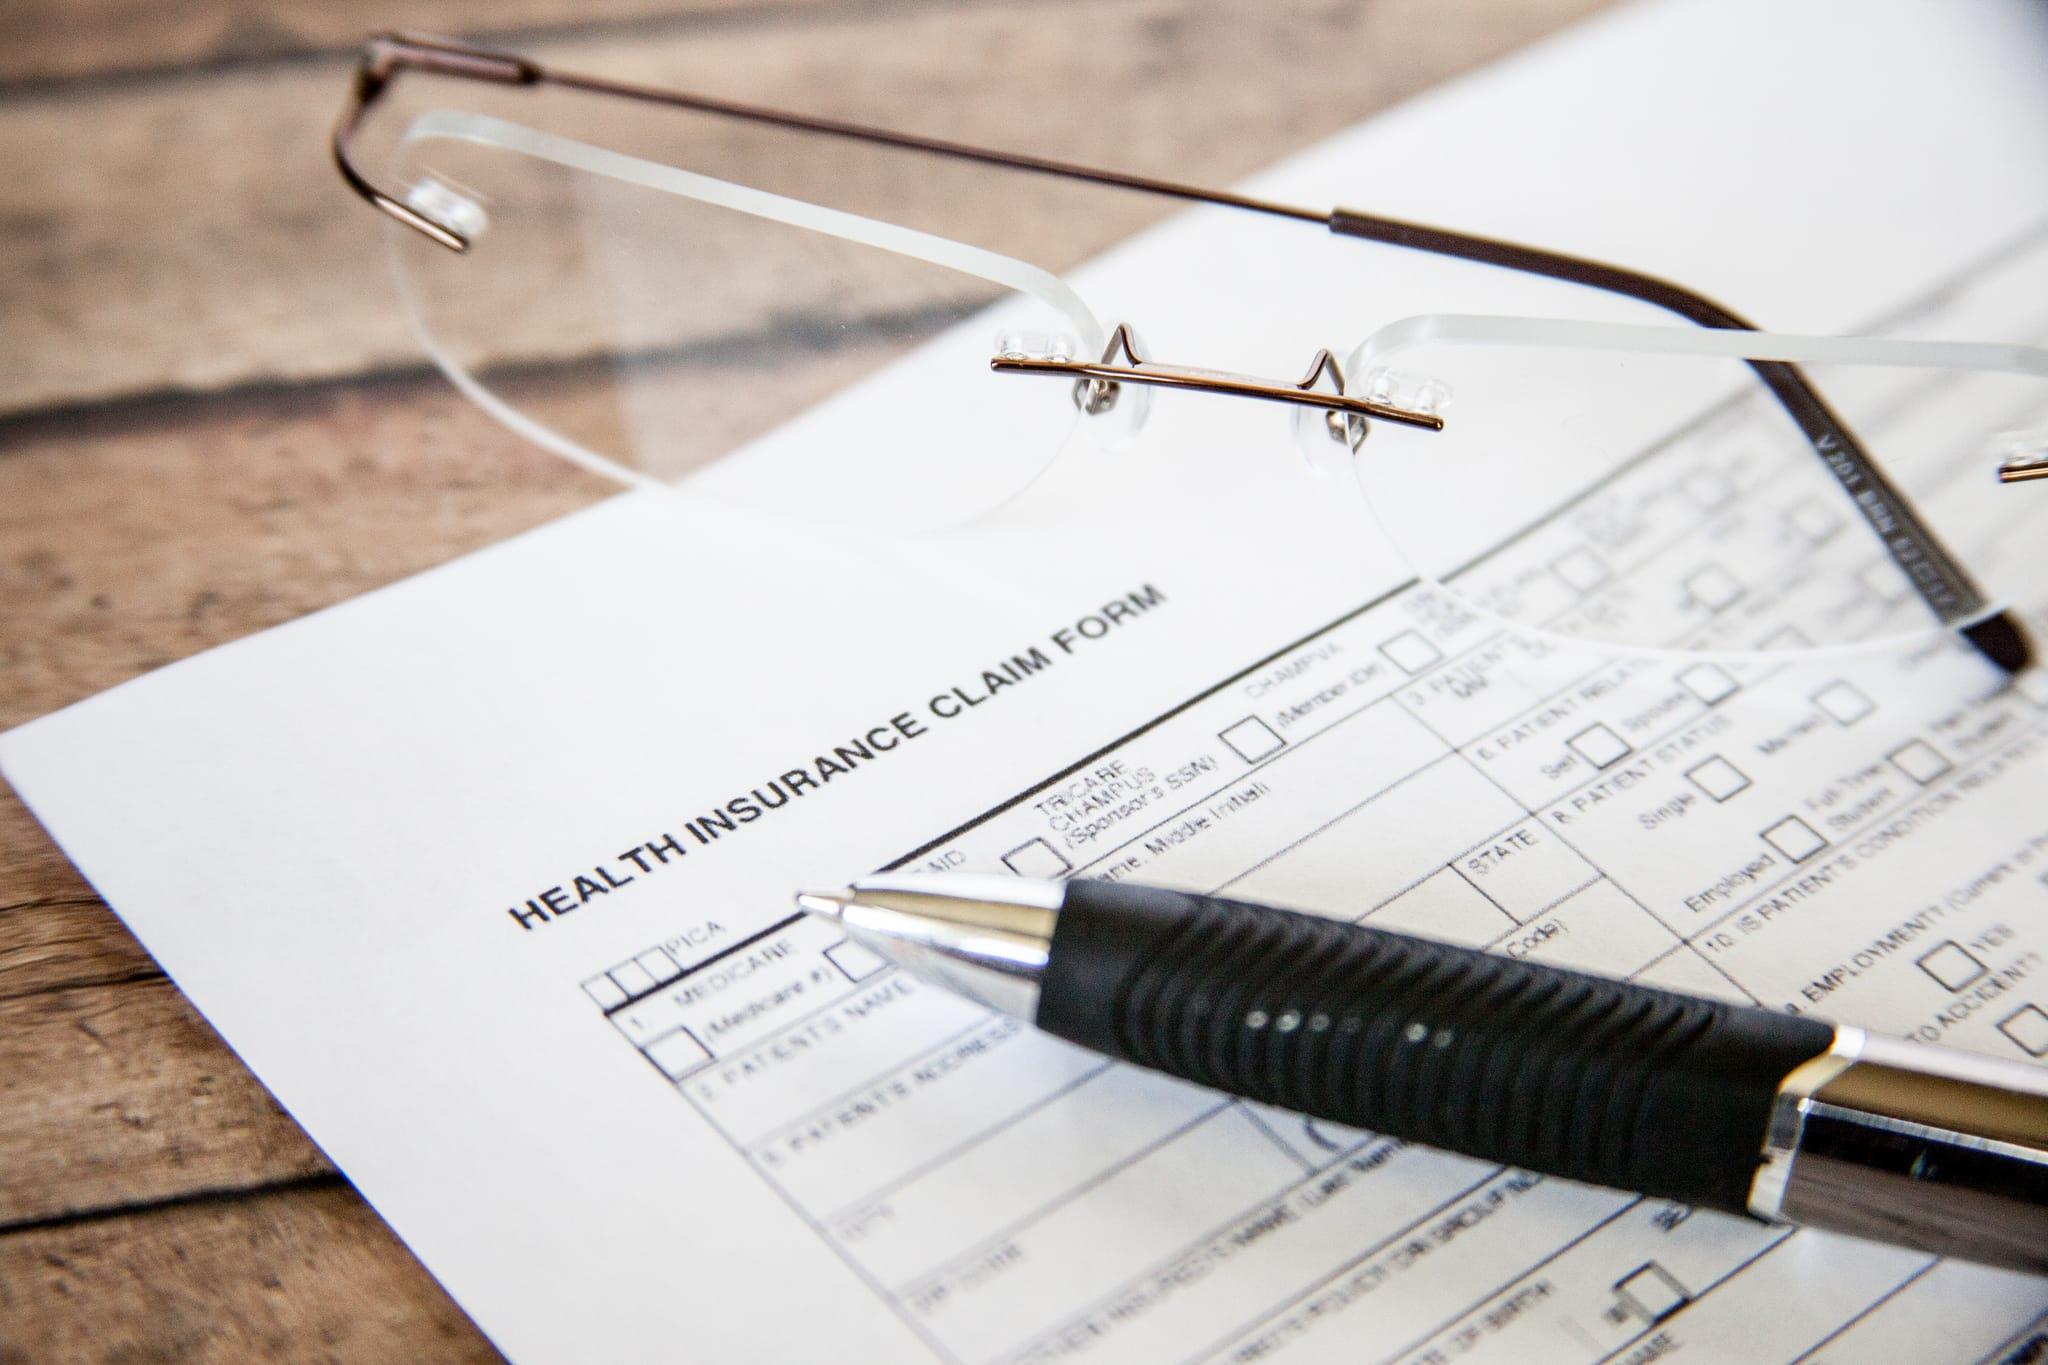 Health Insurance 101: A Primer on Navigating Your Healthcare   HealthCare.com